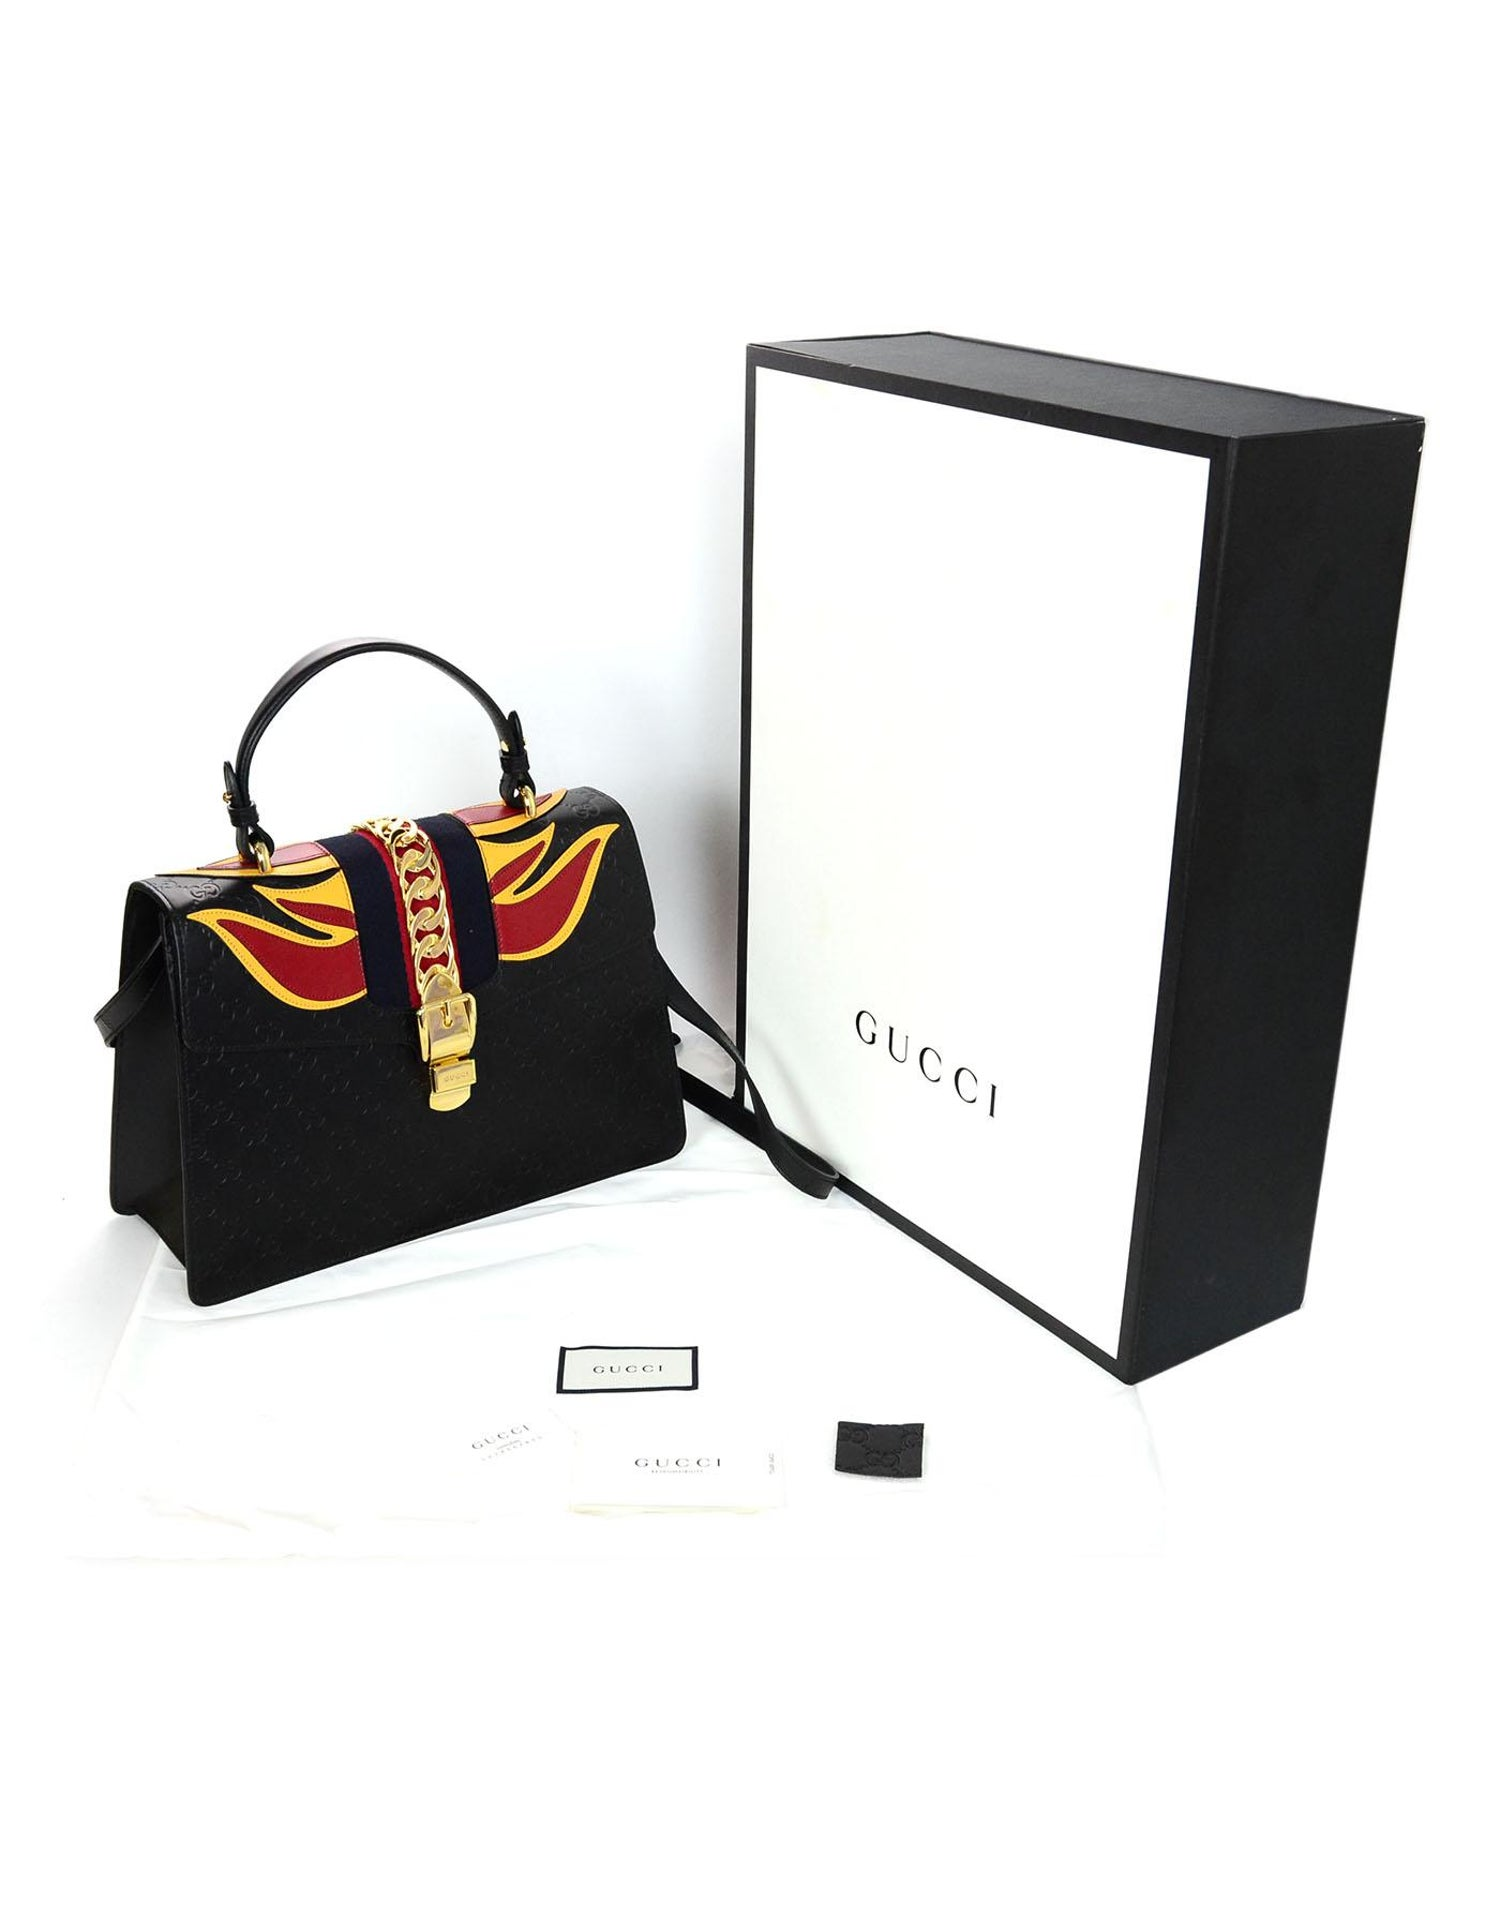 efcd007f986 Gucci Black Leather Monogram Guccissima Medium Sylvie Flame Bag at 1stdibs